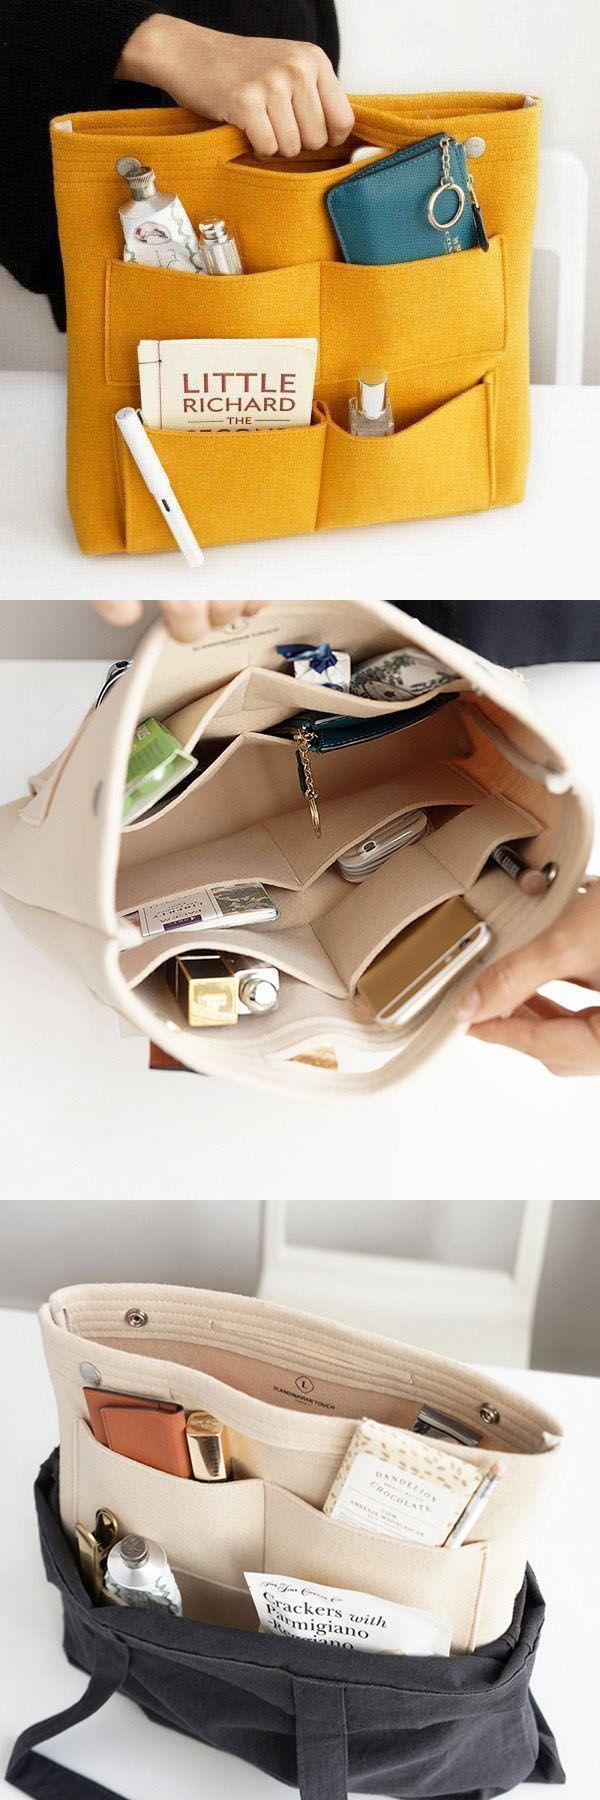 Hot Sale!Bag in Bag Felt Casual Travel Multi-pockets Storage Bag Liner Package Cosmetic Bag